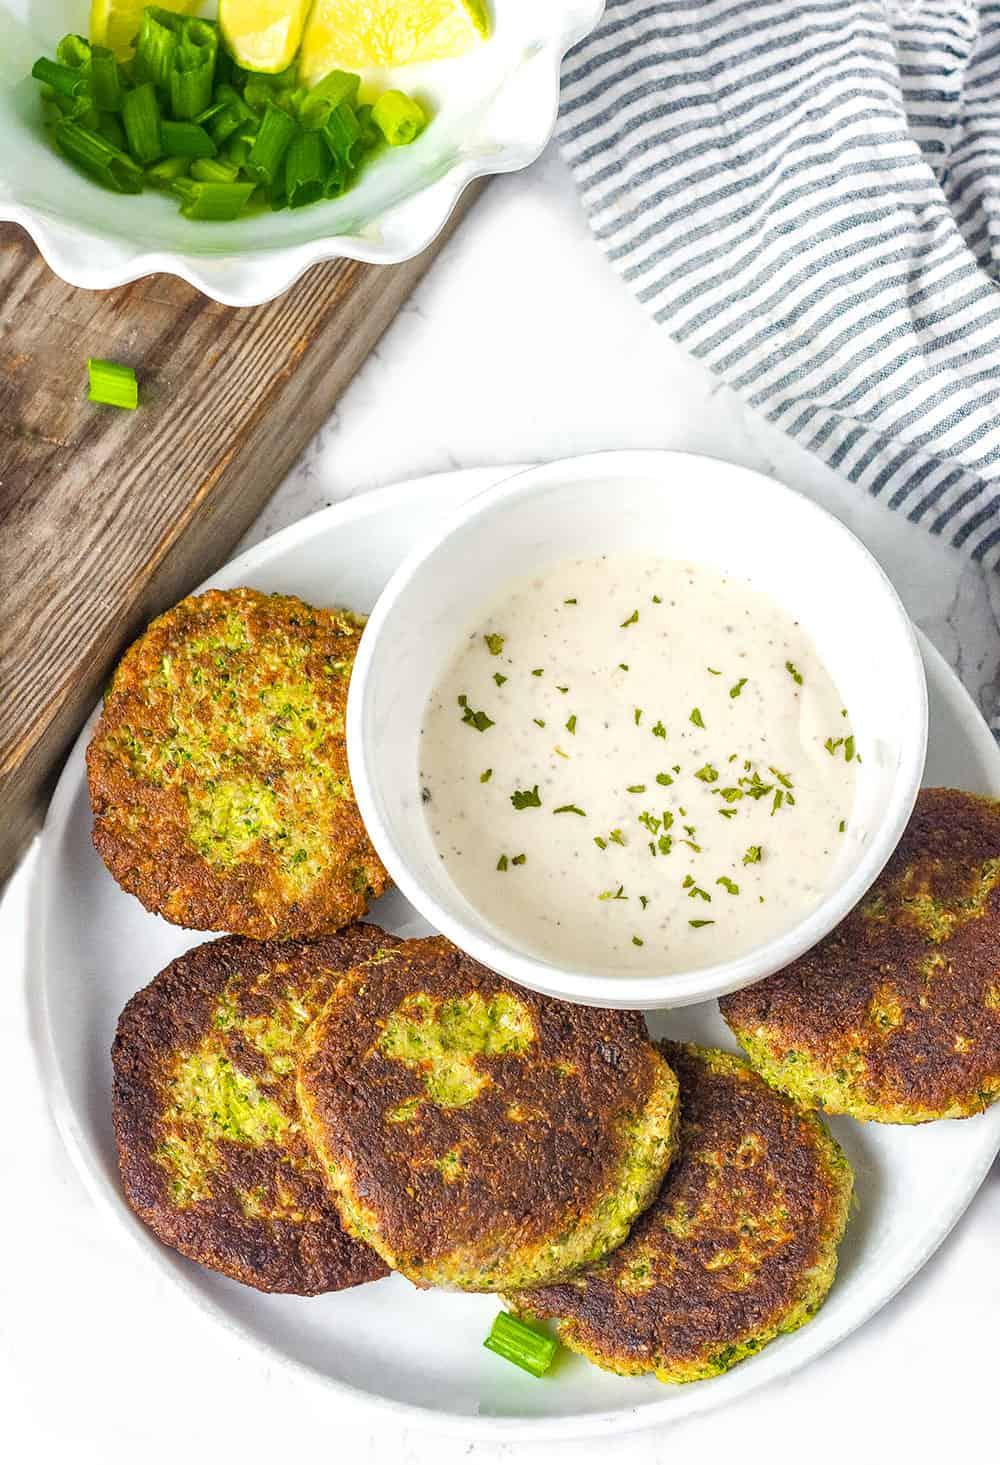 Vegan Broccoli Fritters With Vegan Ranch Dressing